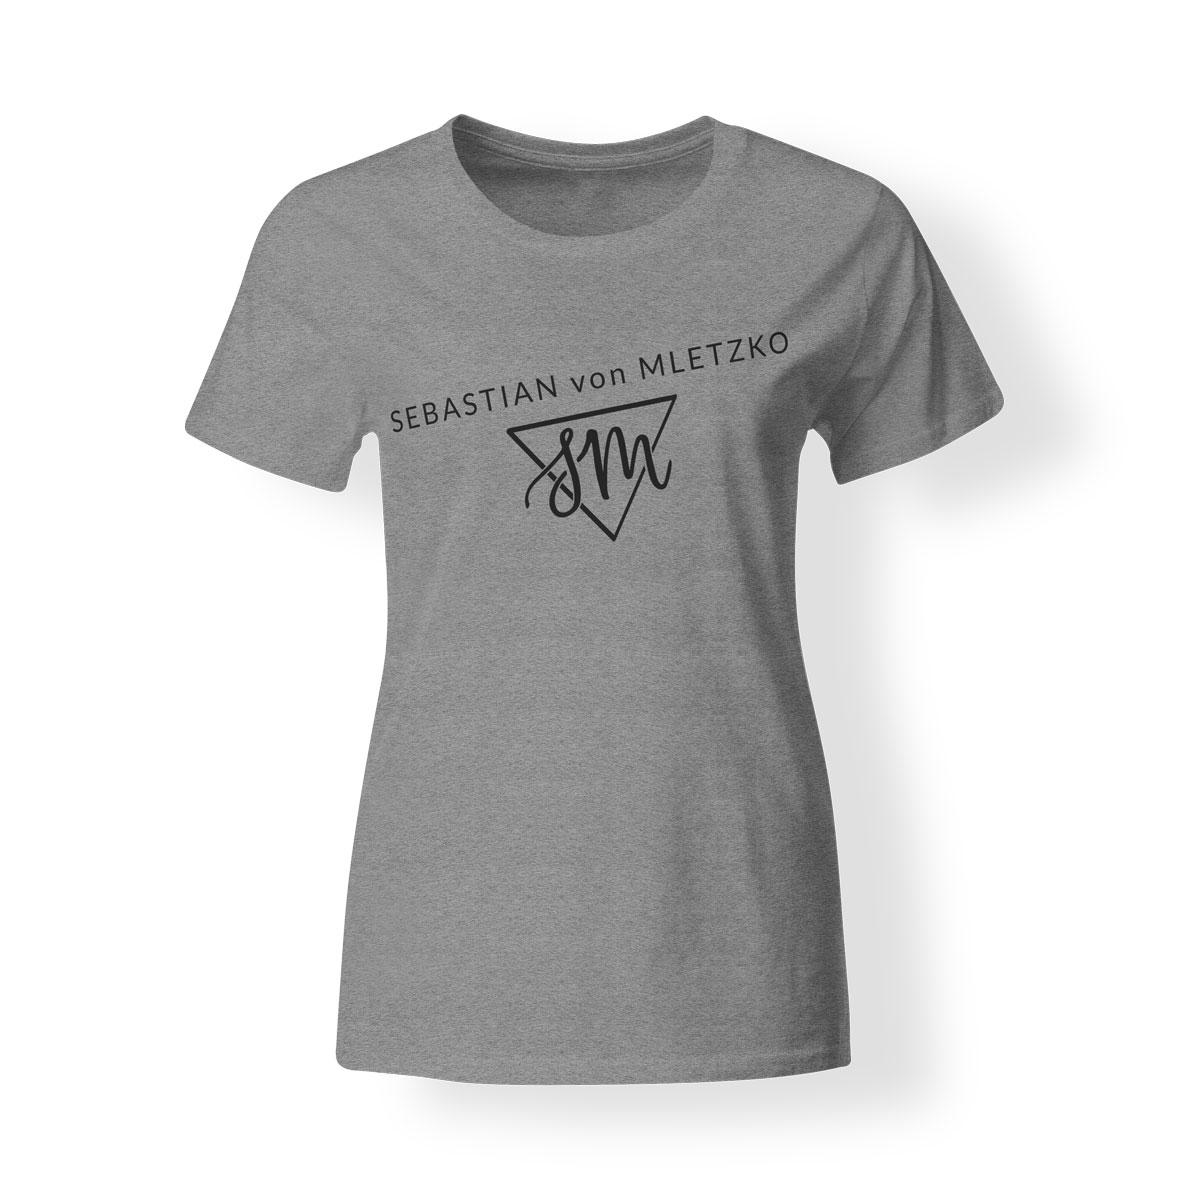 Sebastian von Mletzko T-Shirt Damen grau